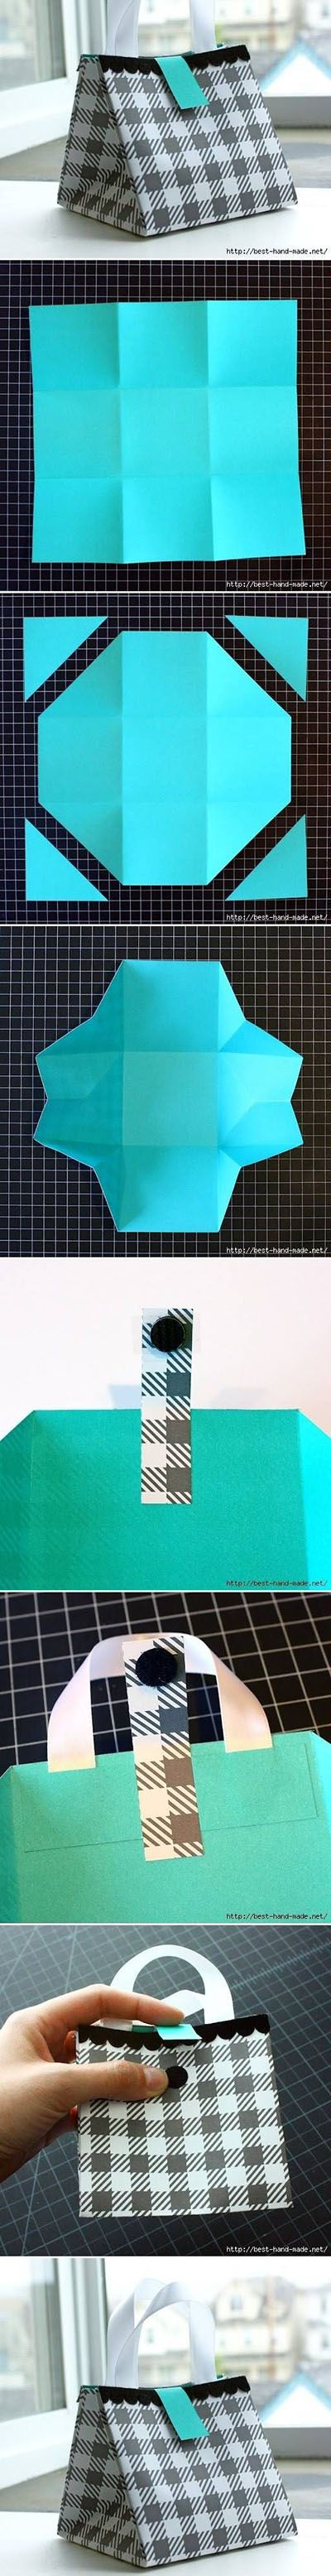 DIY Nice Paper Gift Bag | DIY & Crafts Tutorials